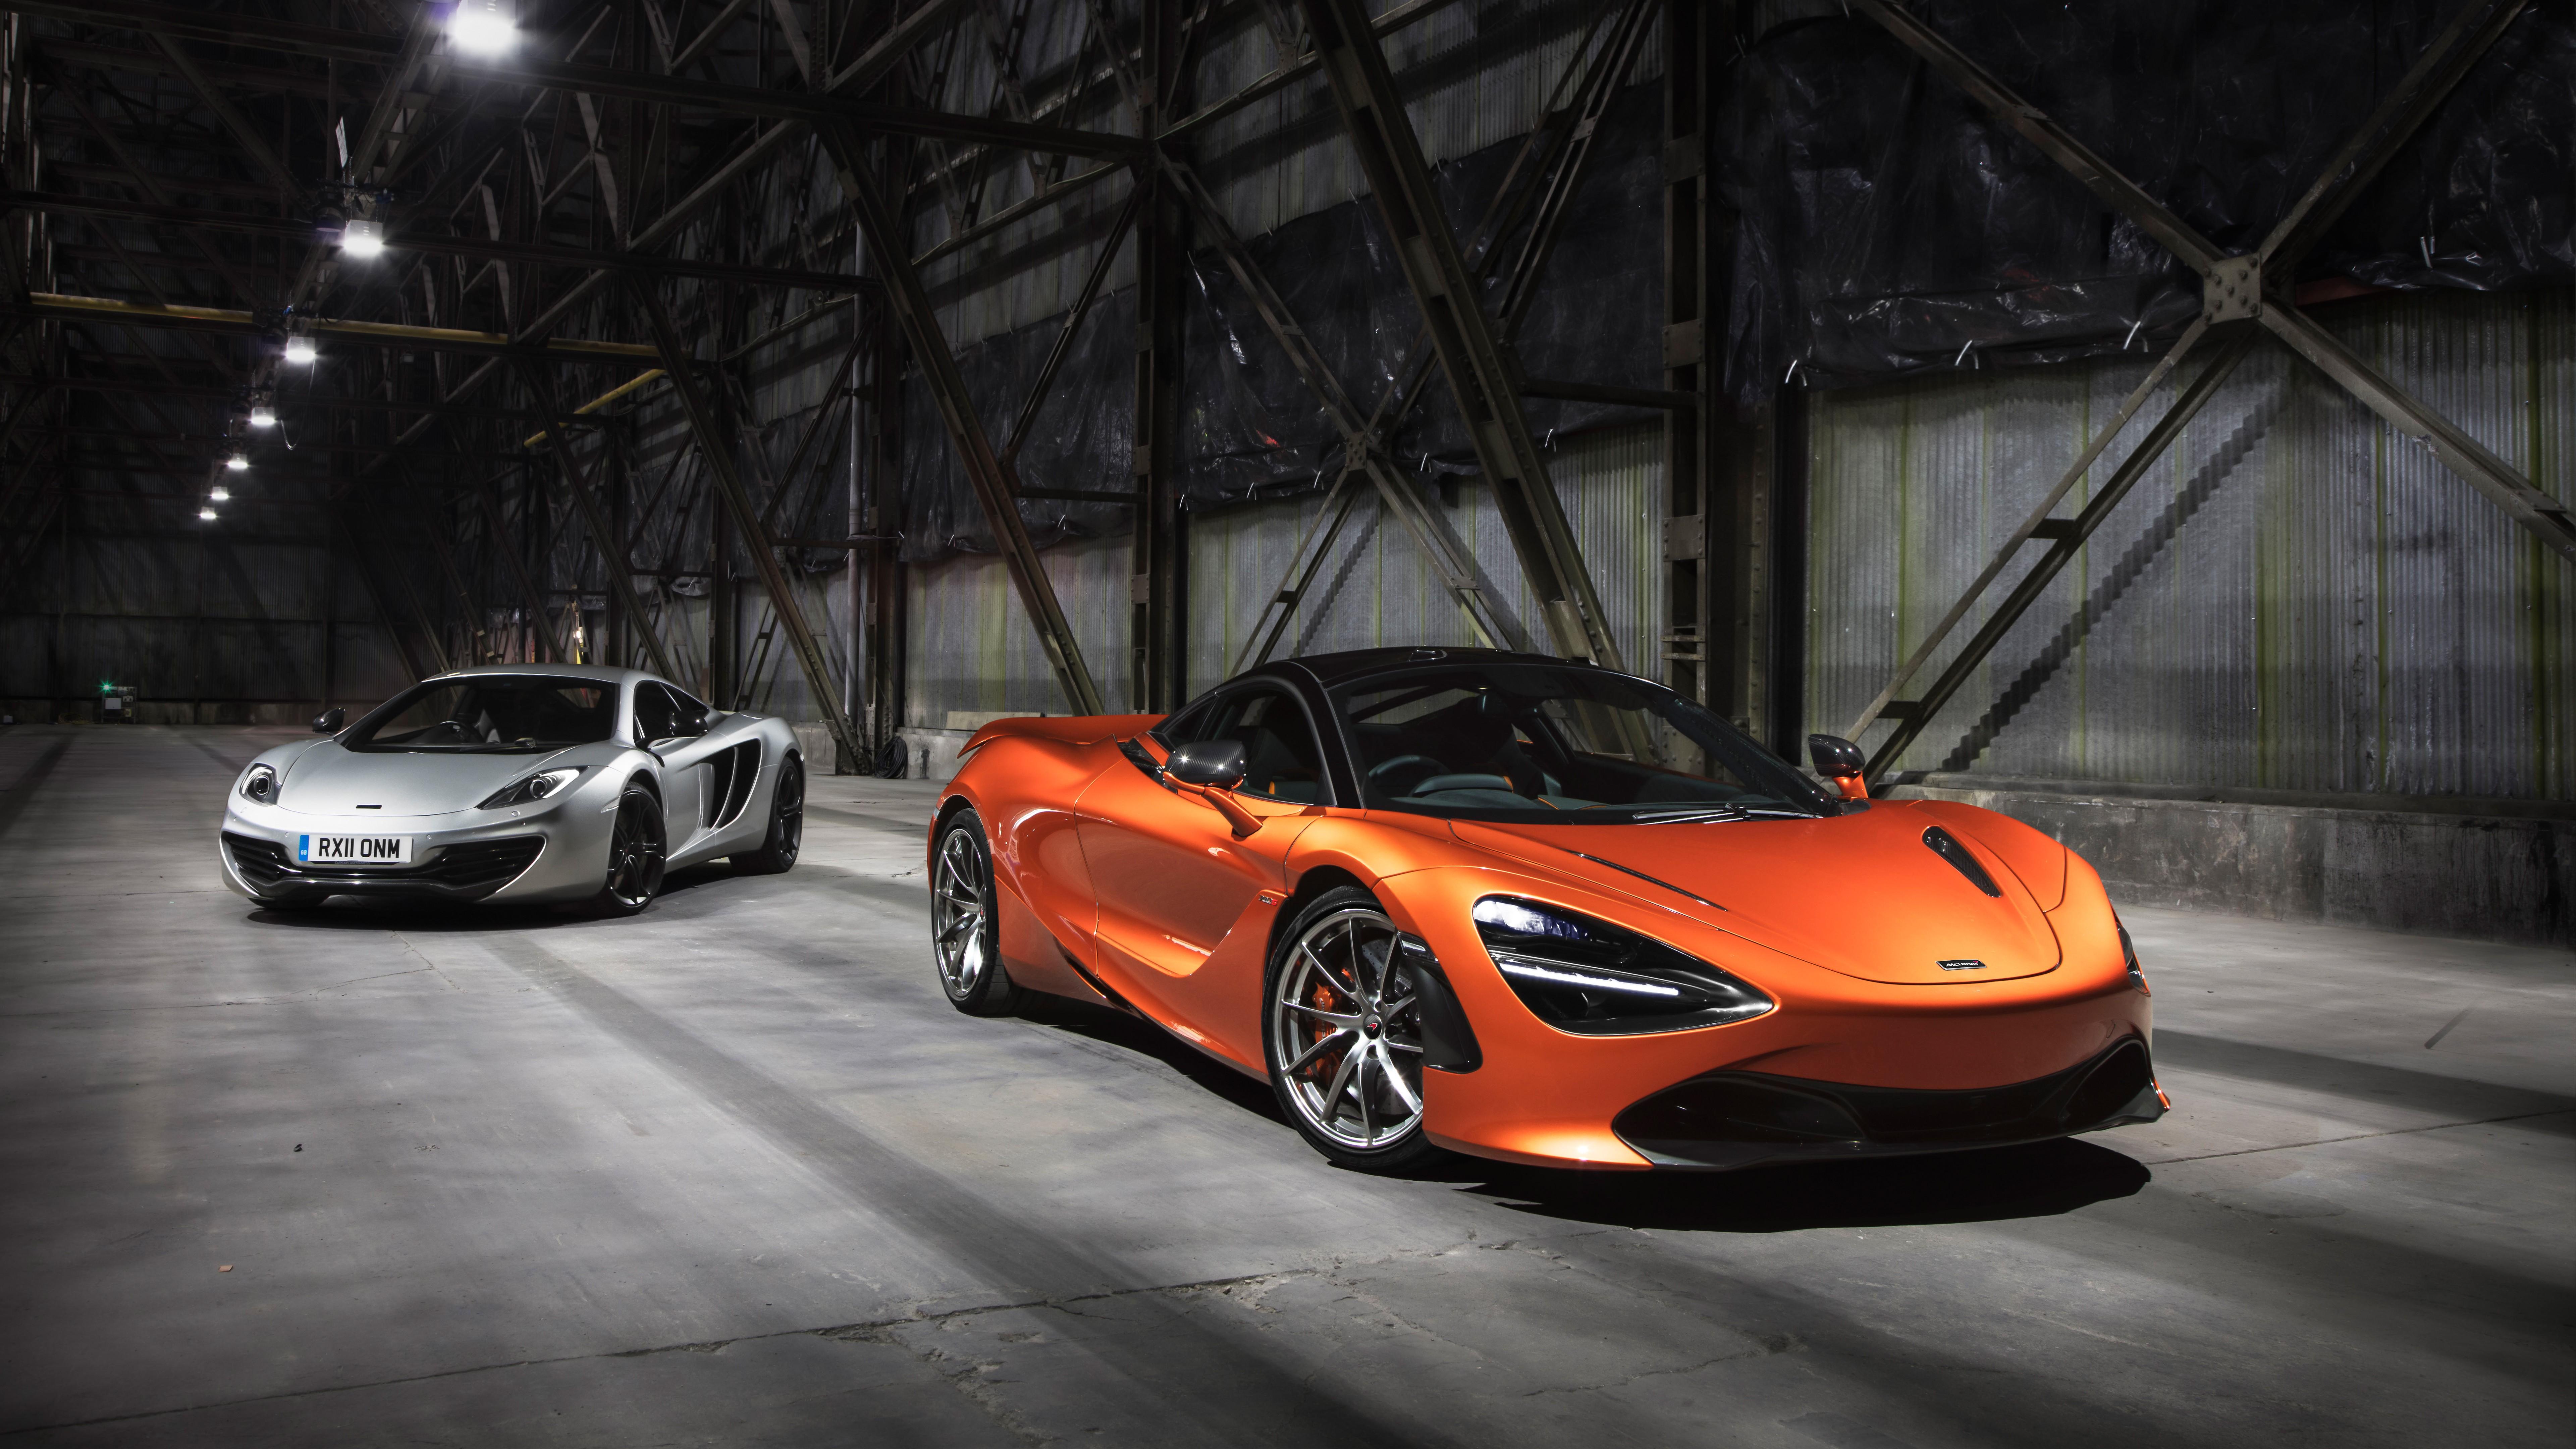 mclaren wallpaper hd,land vehicle,vehicle,car,supercar,sports car